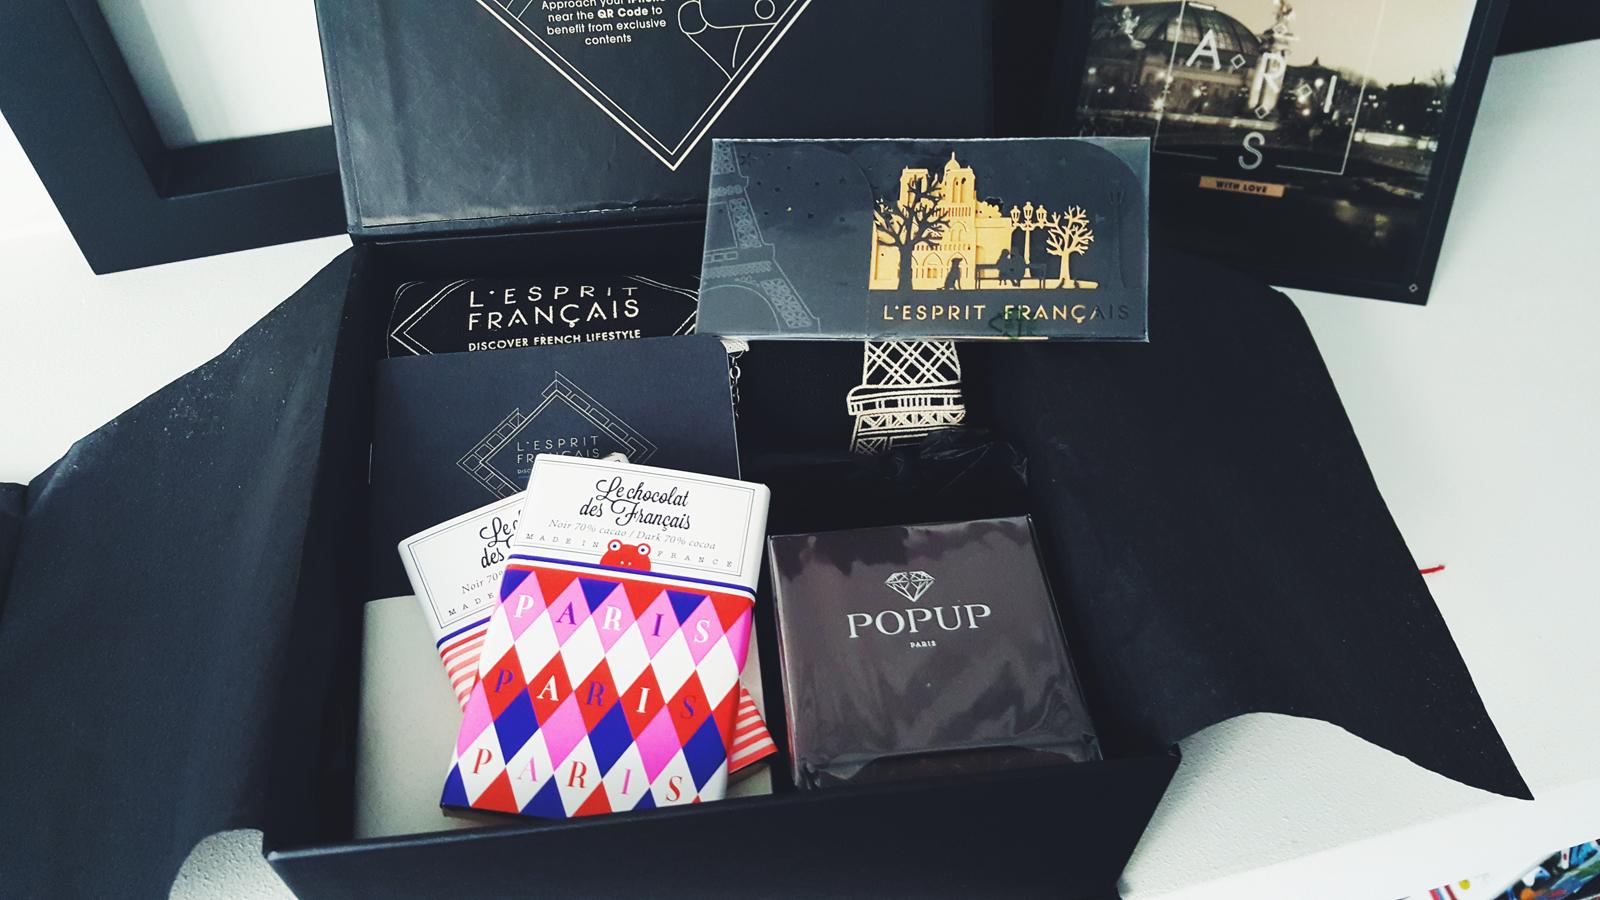 L esprit francais gift box collection Paris City Guide discover french style experience the parisian lifestyle chocolate candle postcard bracelet photo usofparis blog